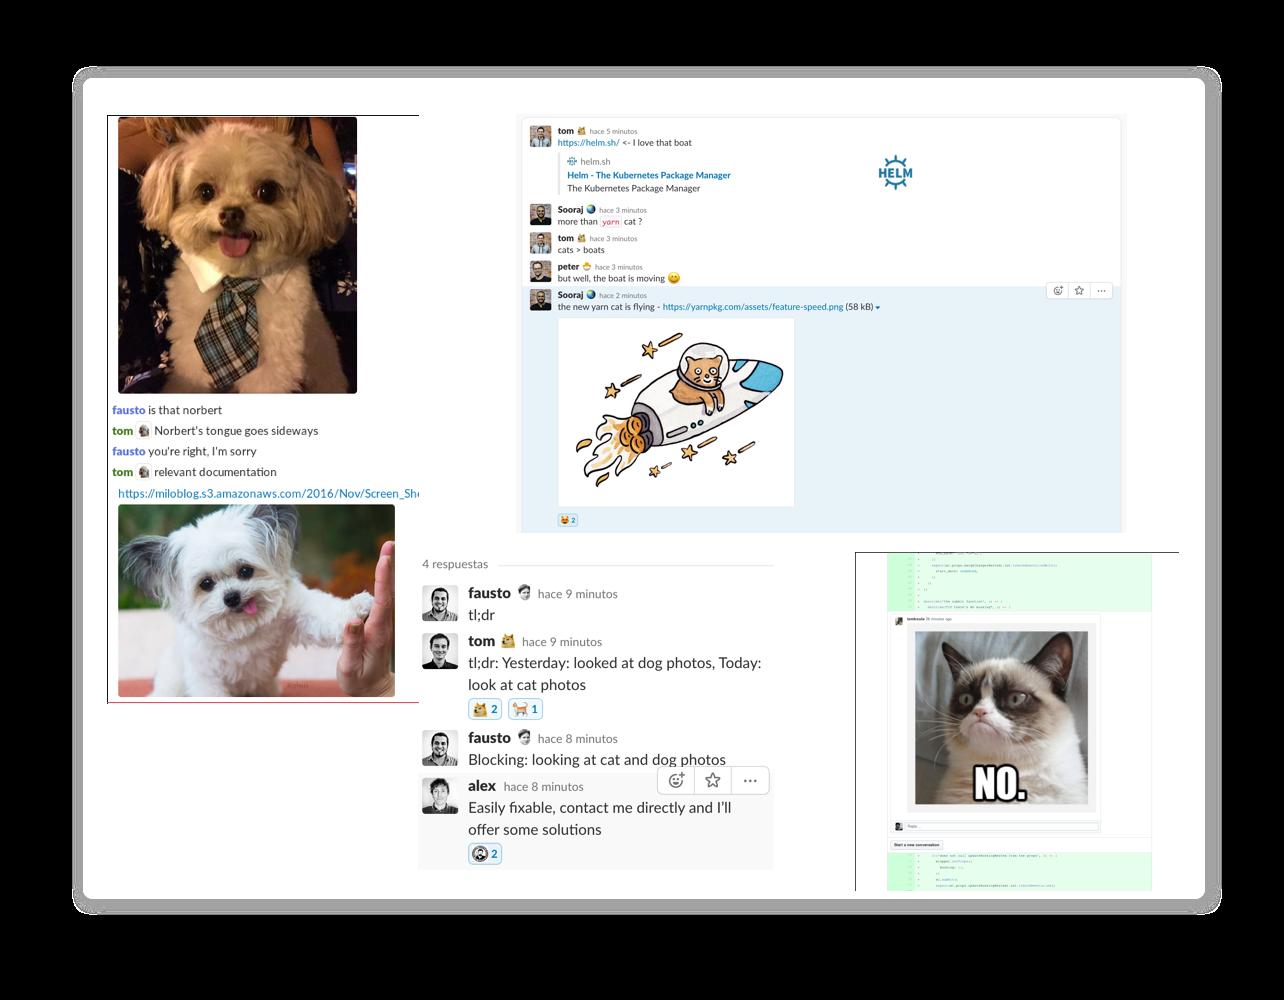 store2be communication in Slack.